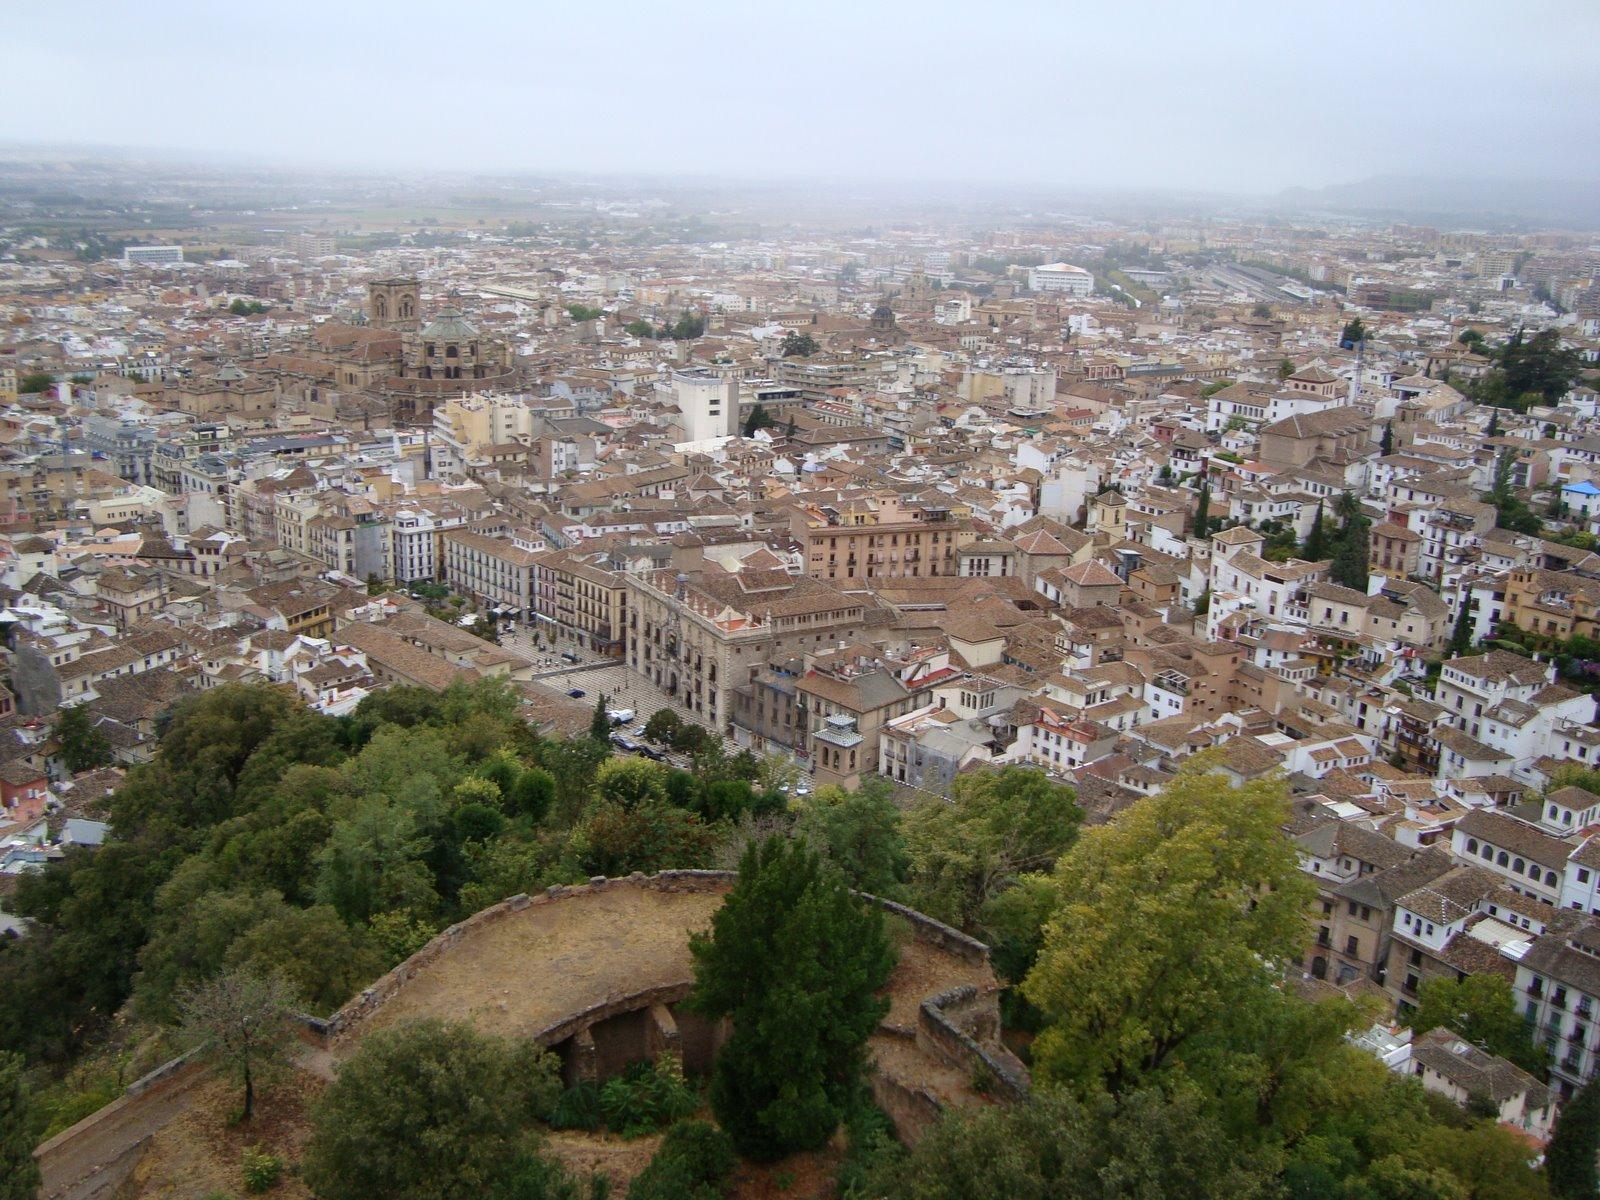 territory of Granada